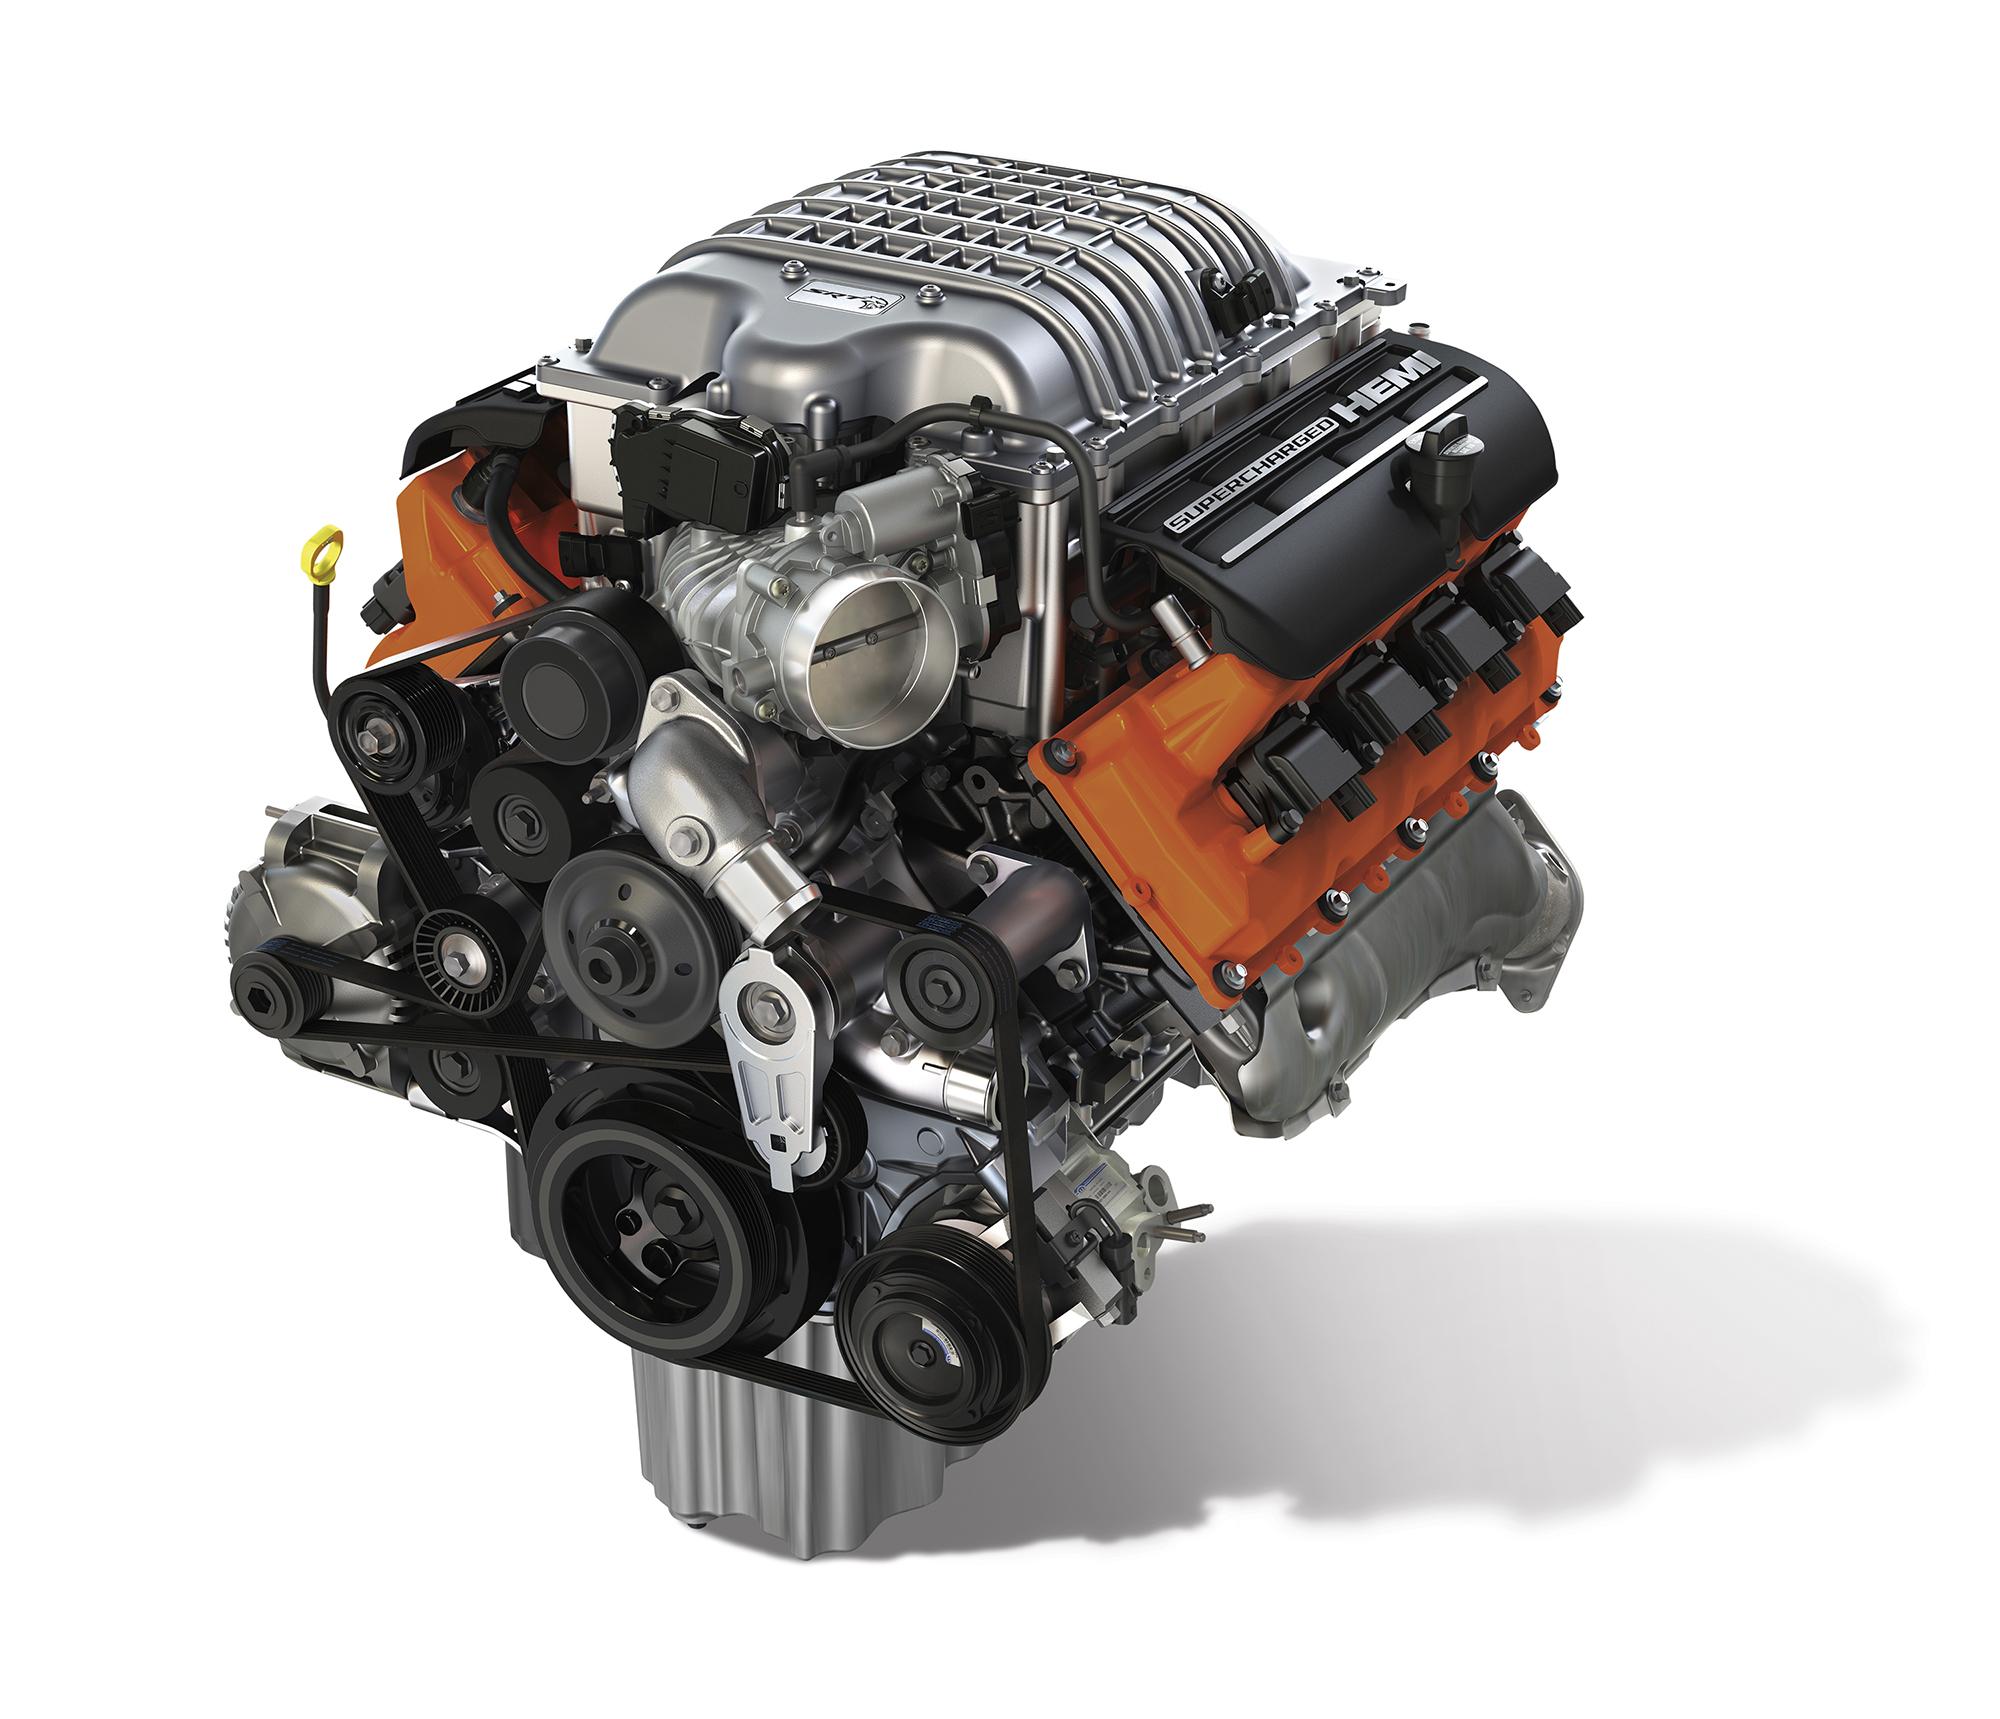 Dodge Supercharted Hemi Engine